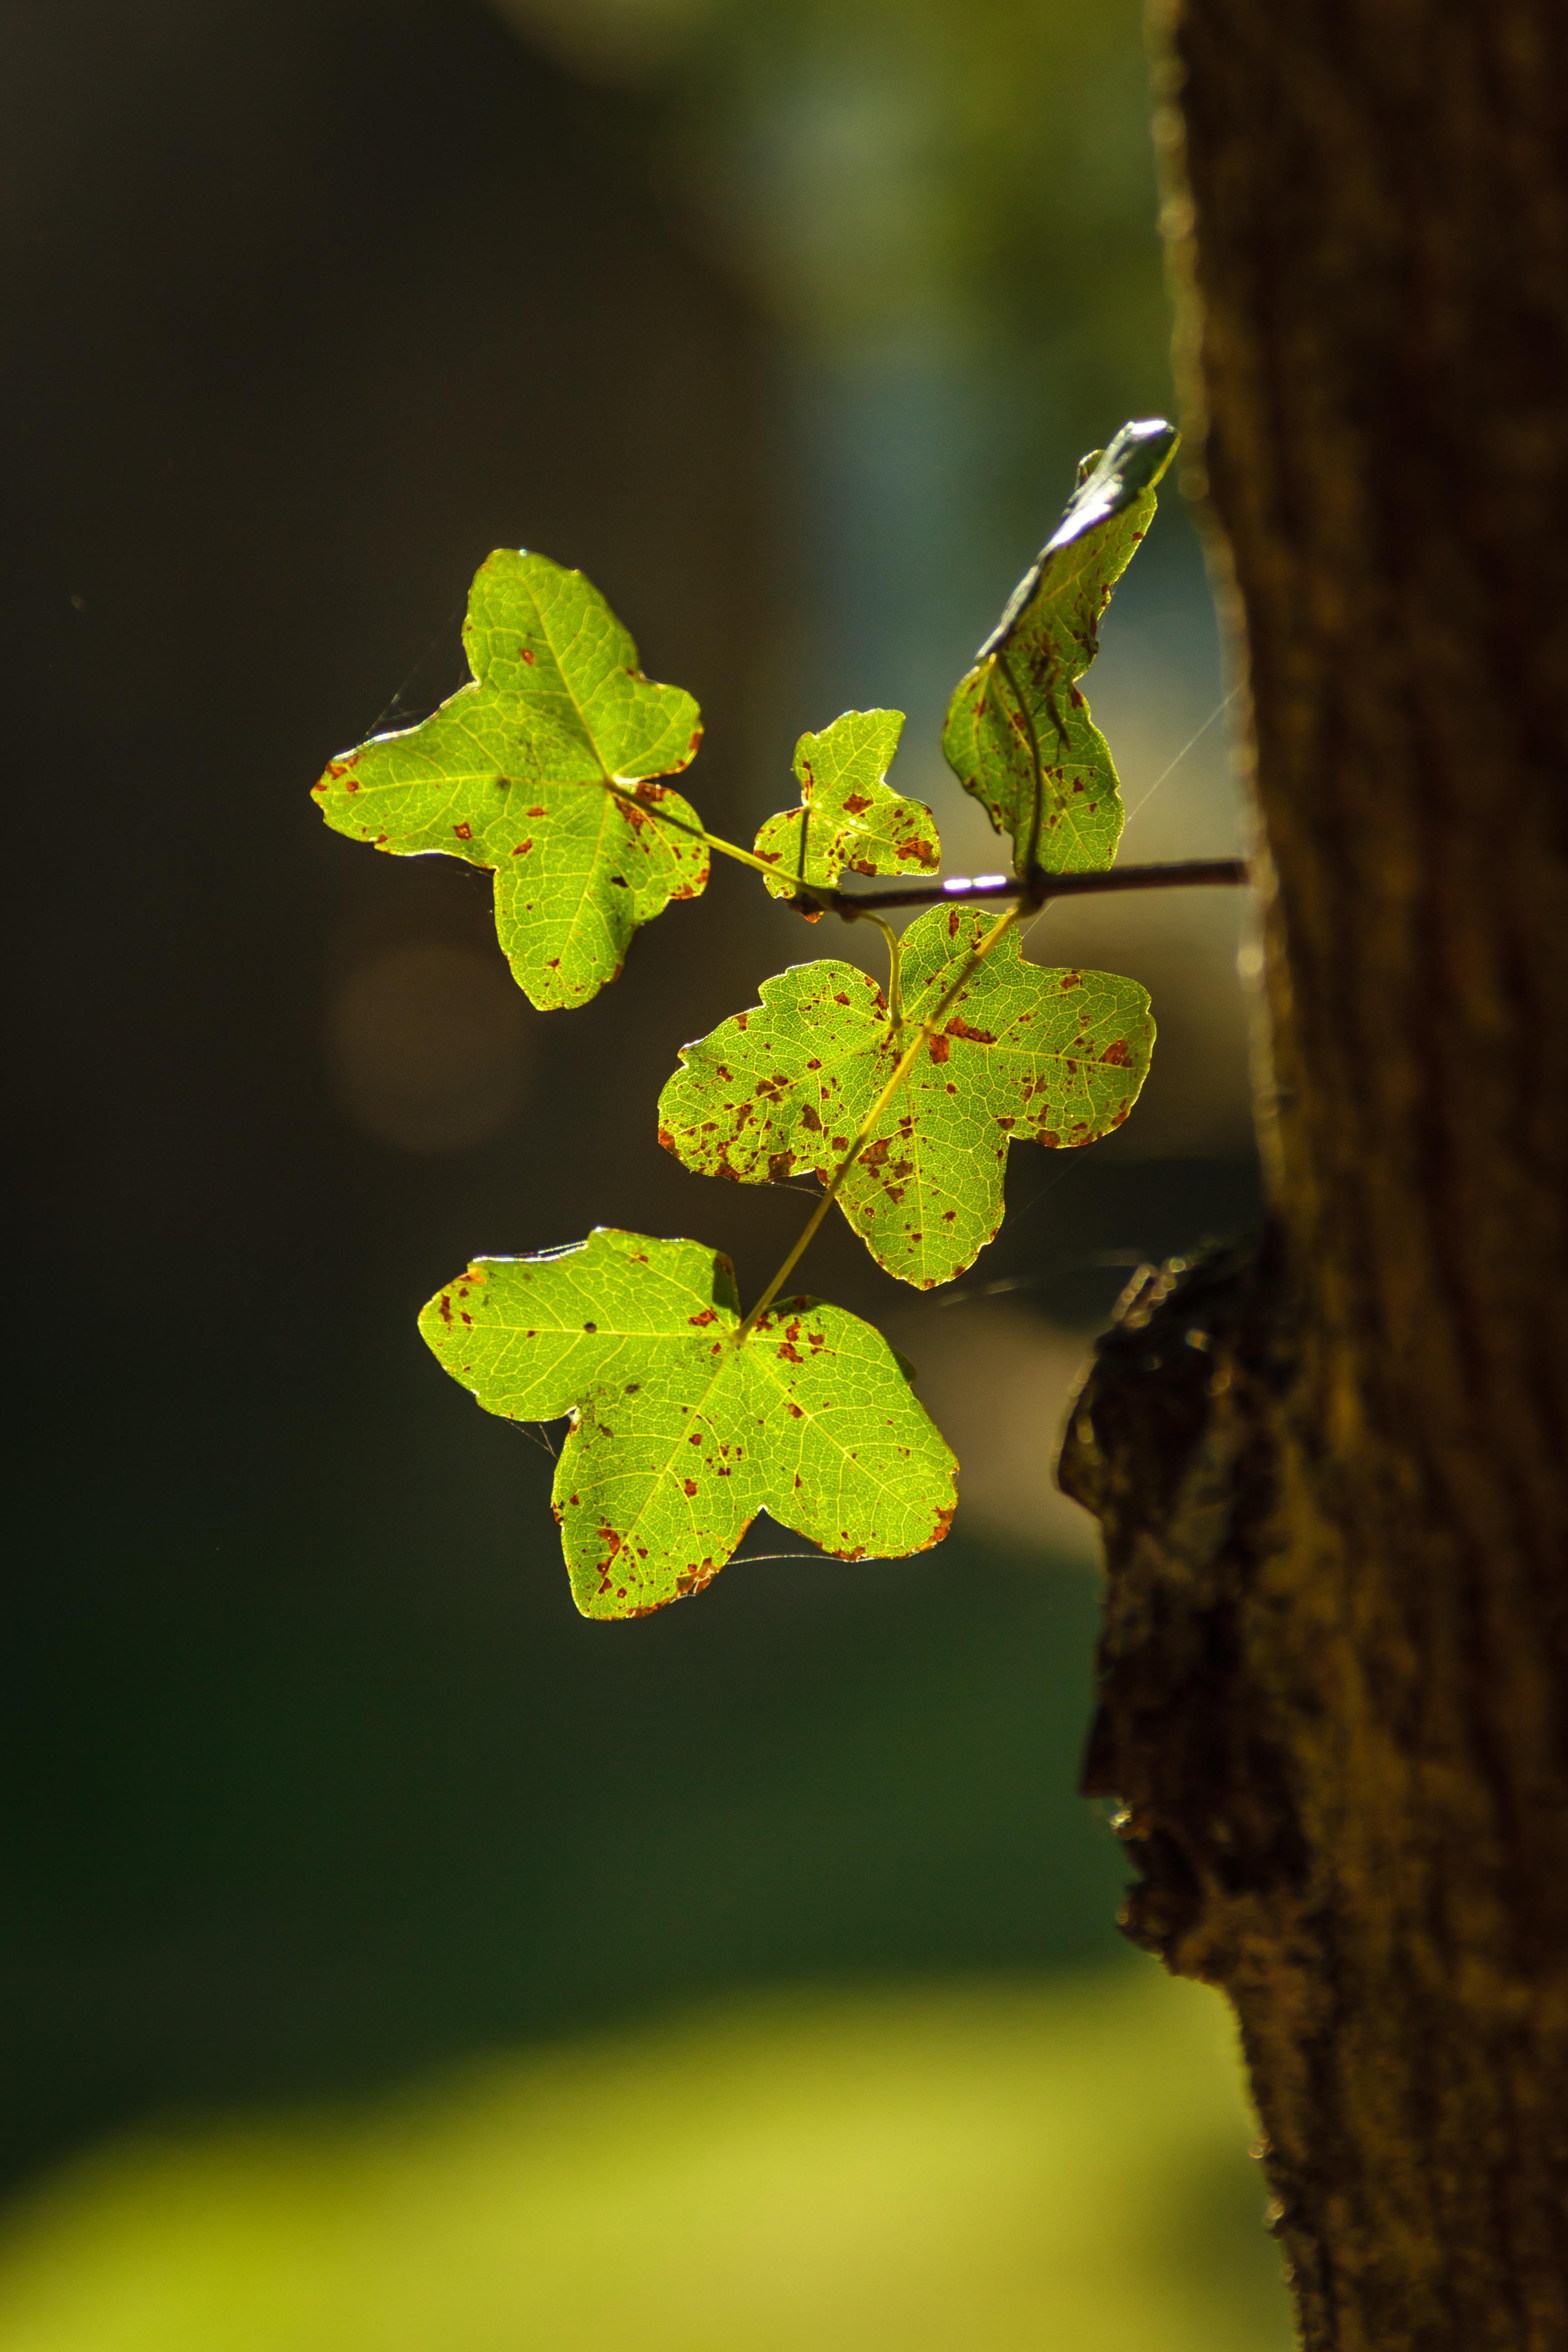 Free Images : tree, nature, branch, grain, sunlight, leaf, flower ...